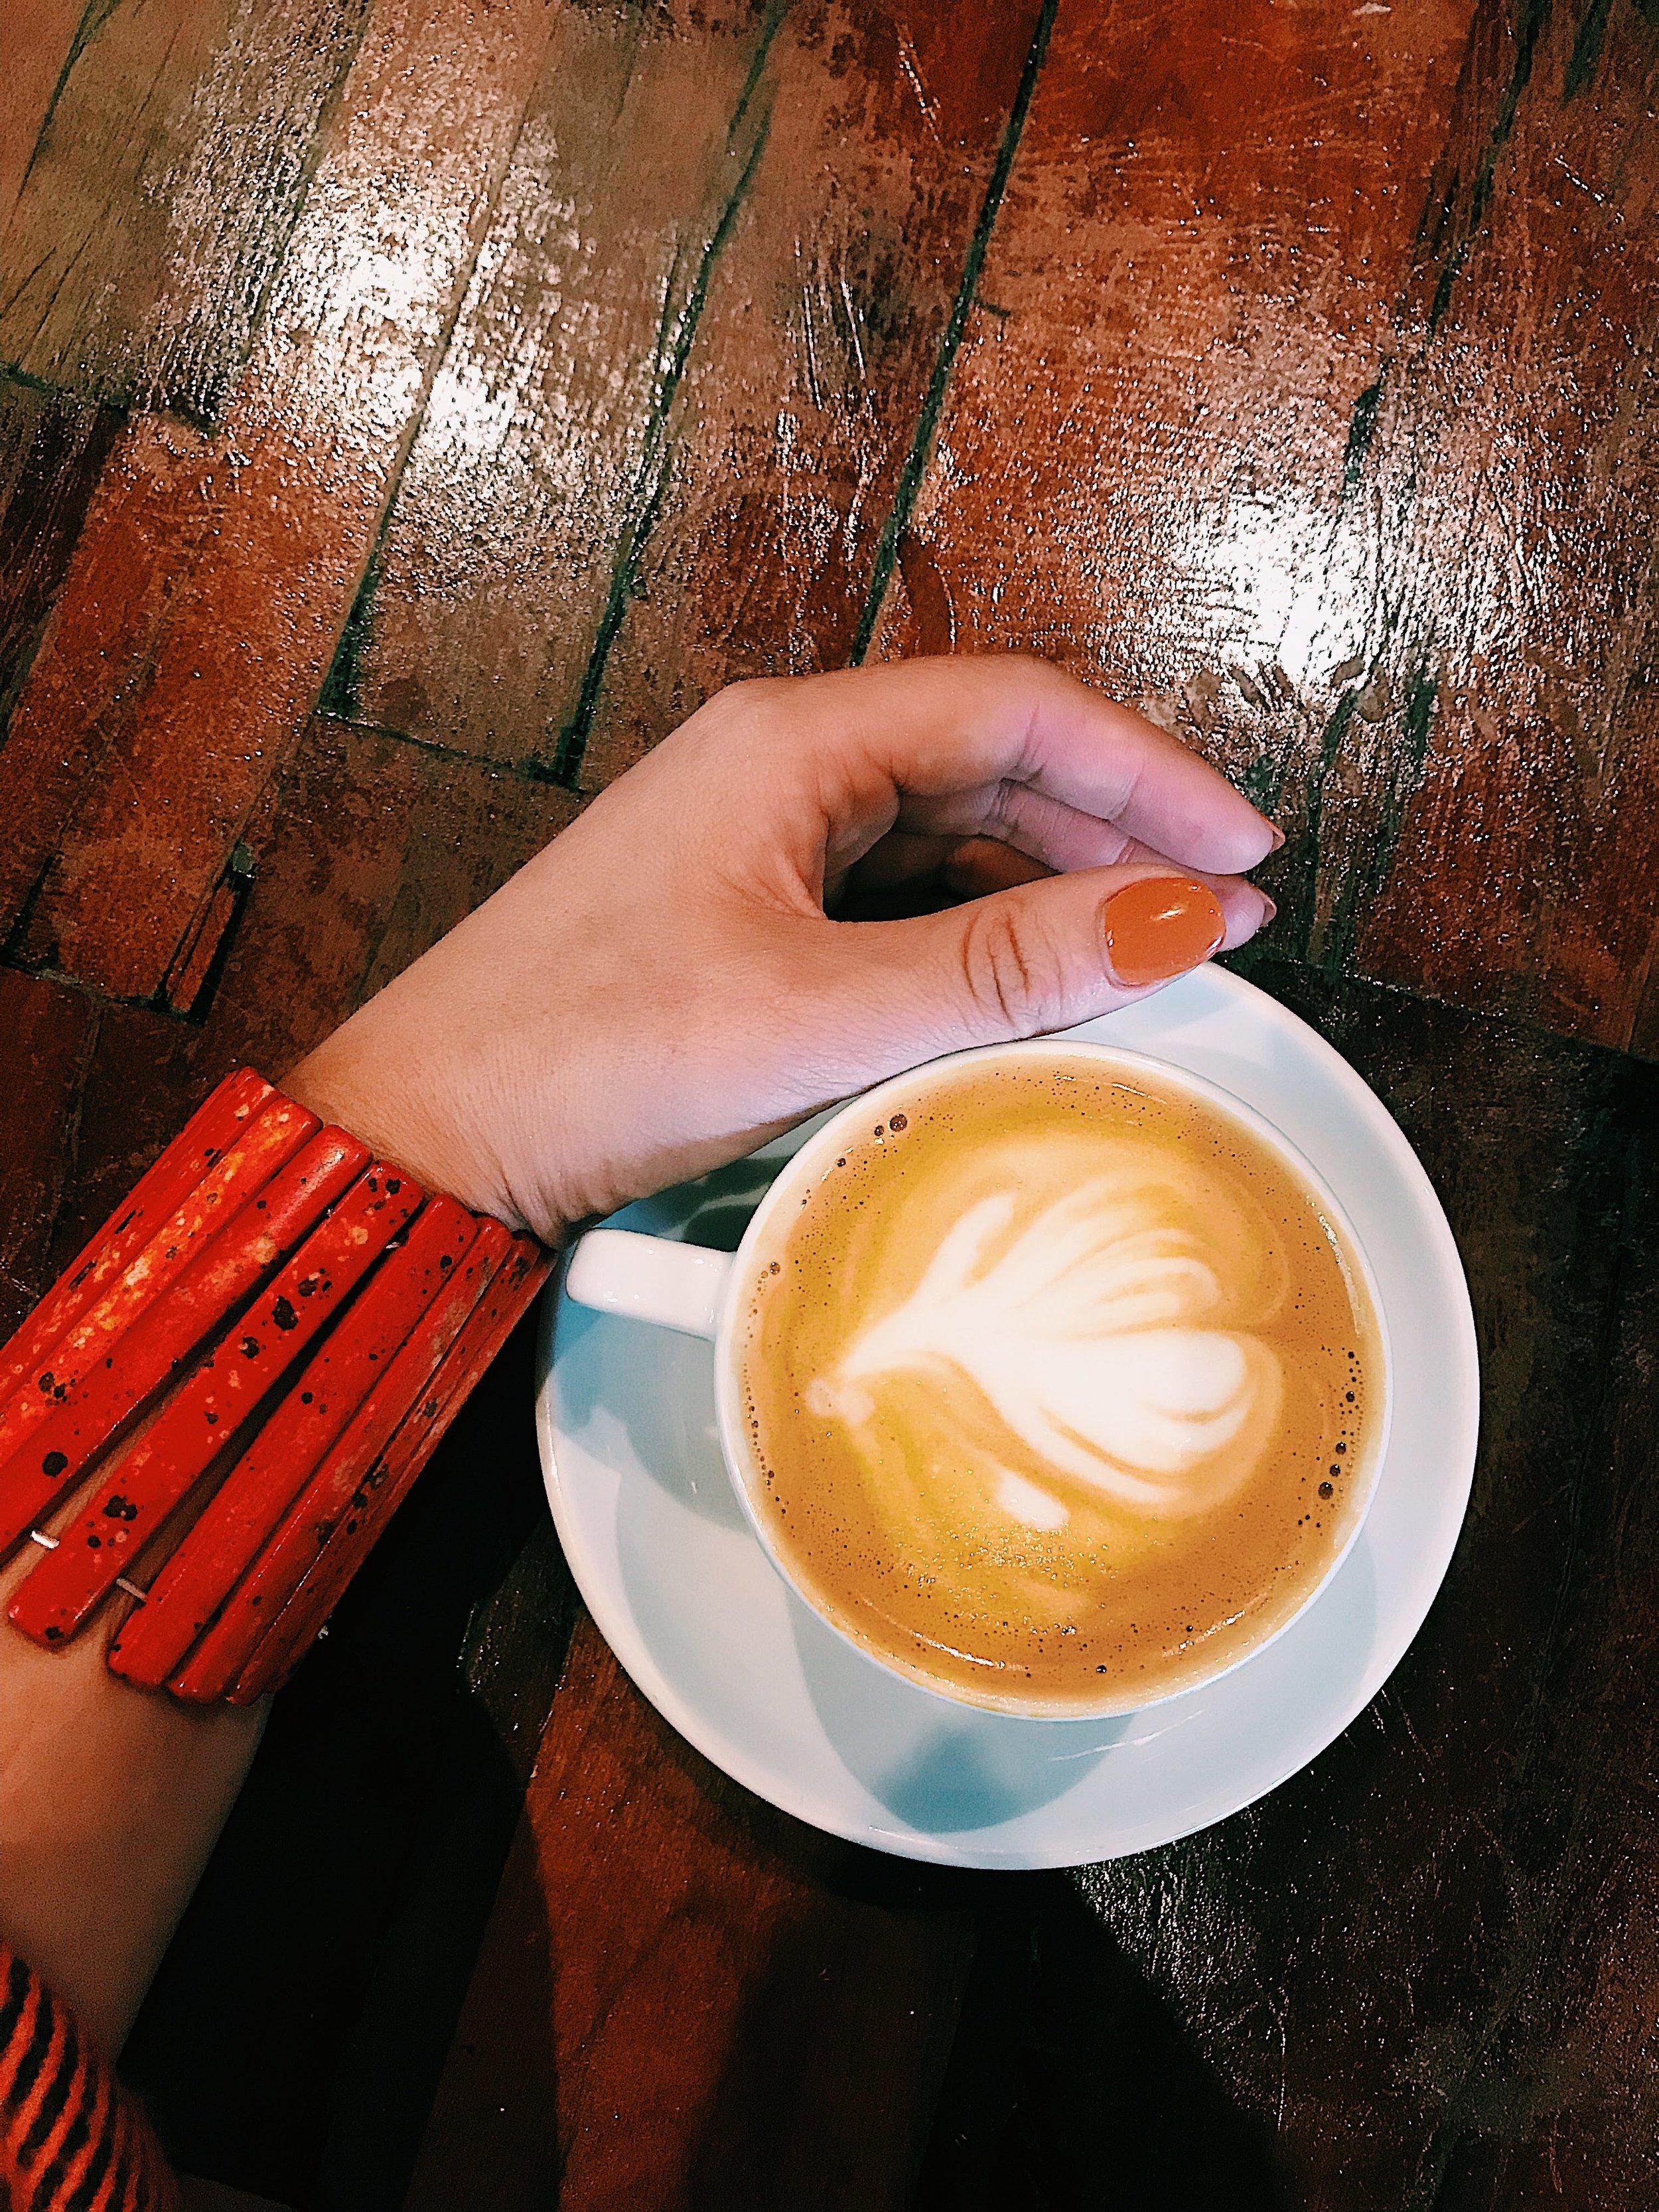 Three Heel Clicks - Siphon Coffee and Cozy Poncho - Houston Hotspots (12).jpg